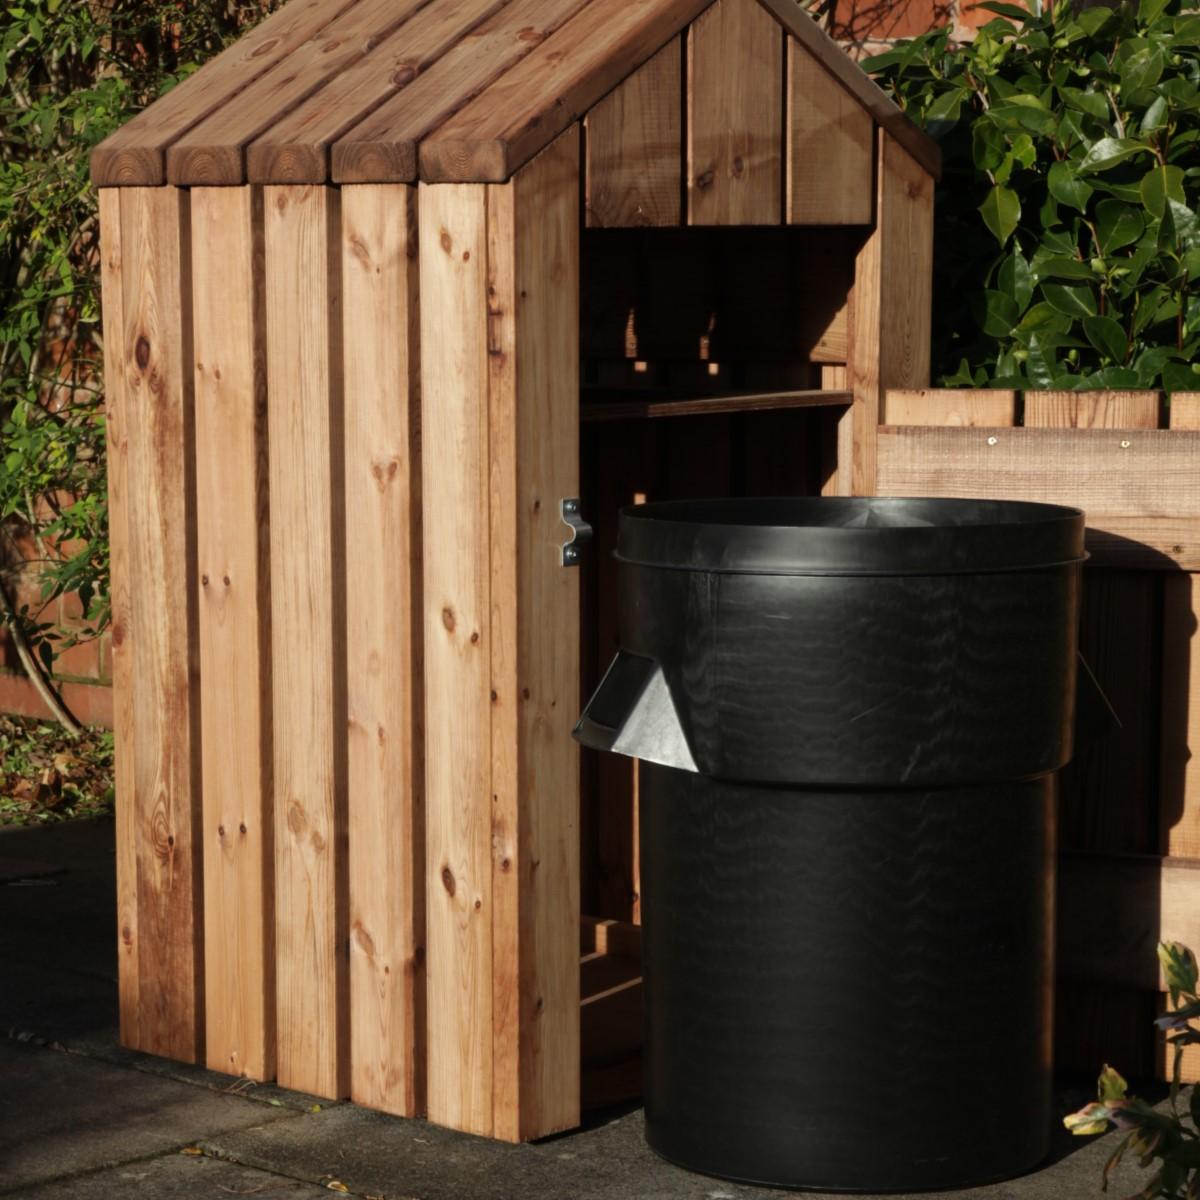 A wooden litterbin with front door open showing black plastic bin inside